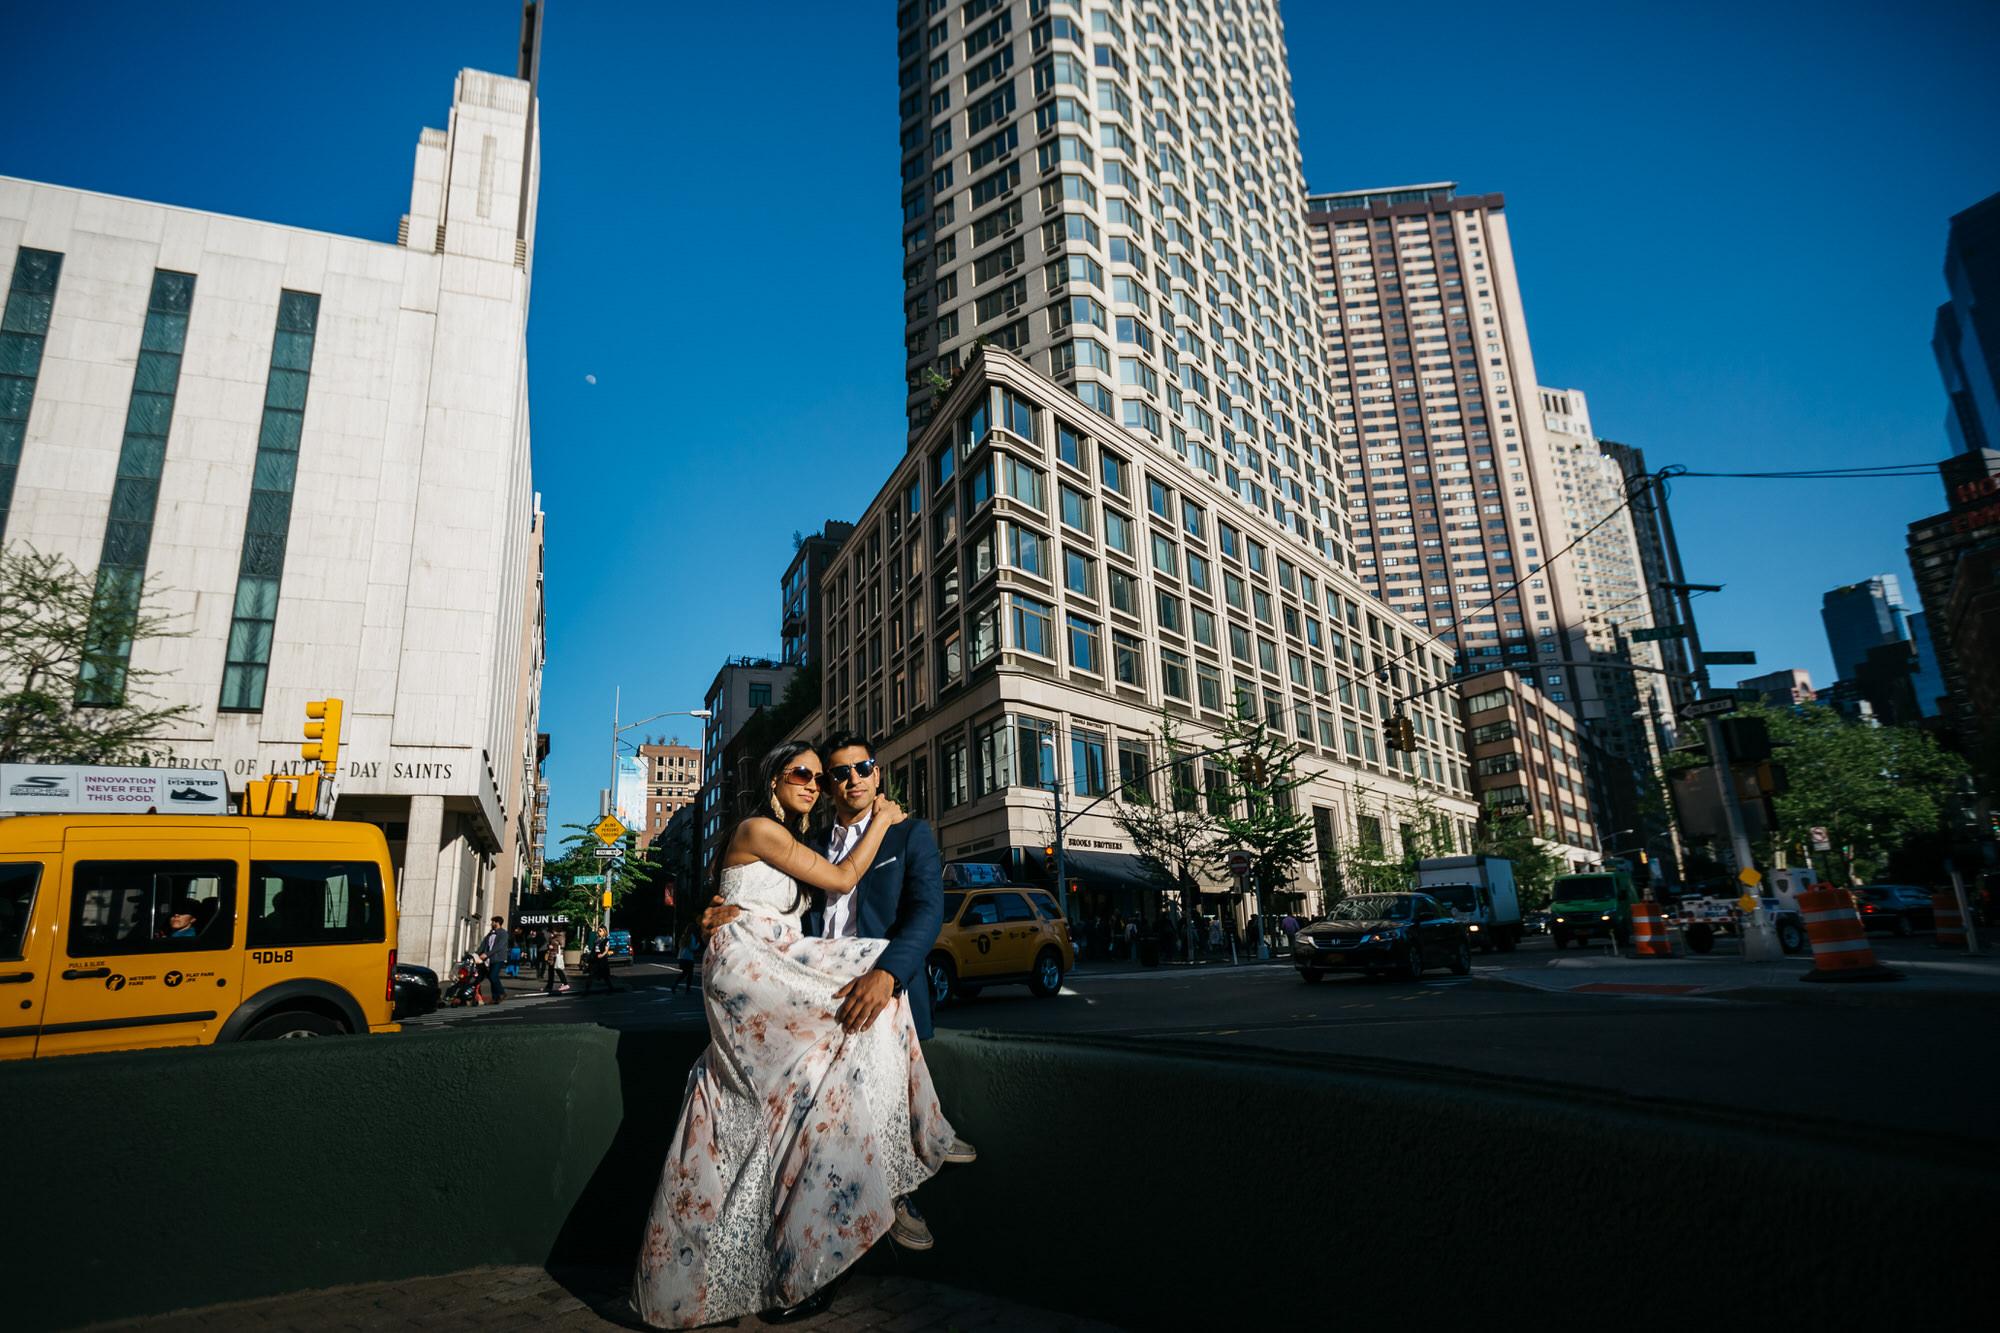 Kinisha-Neil-Eng-NYC-189-1.jpg